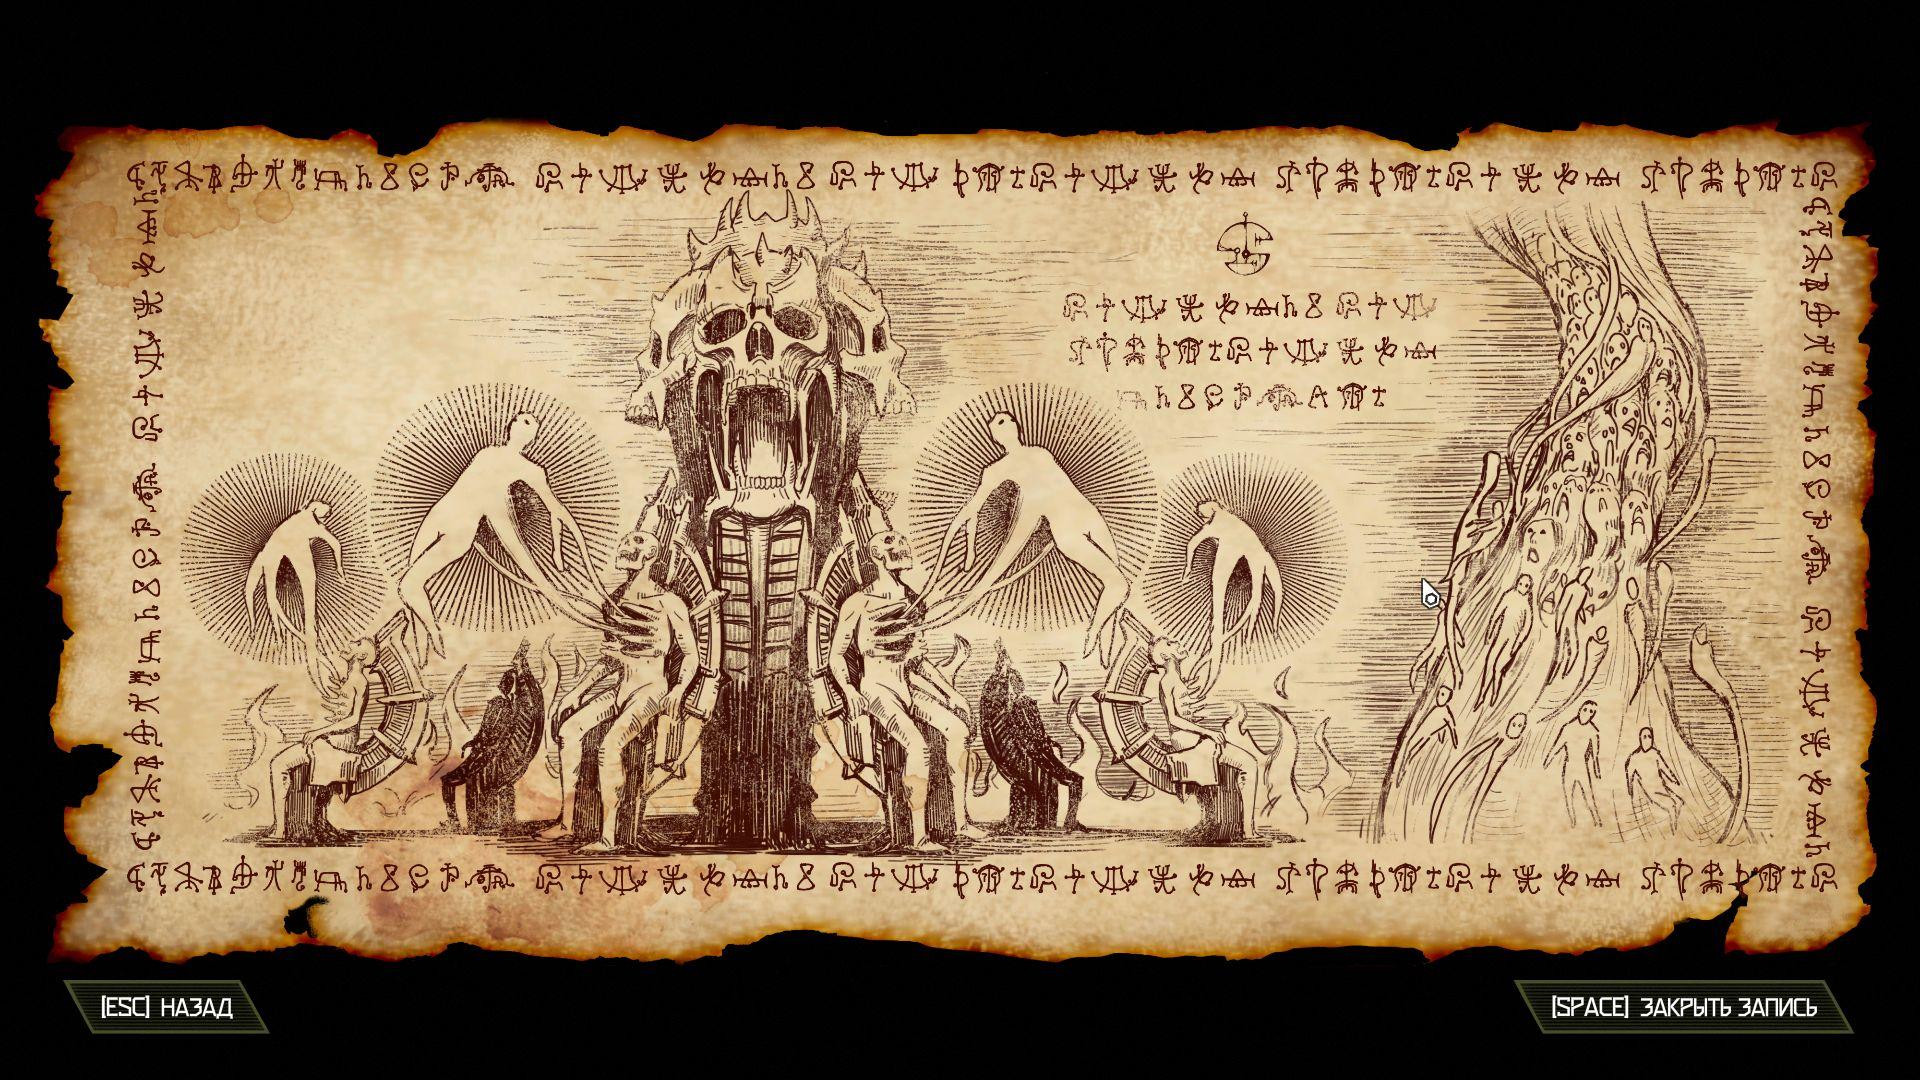 000166.Jpg - Doom Eternal